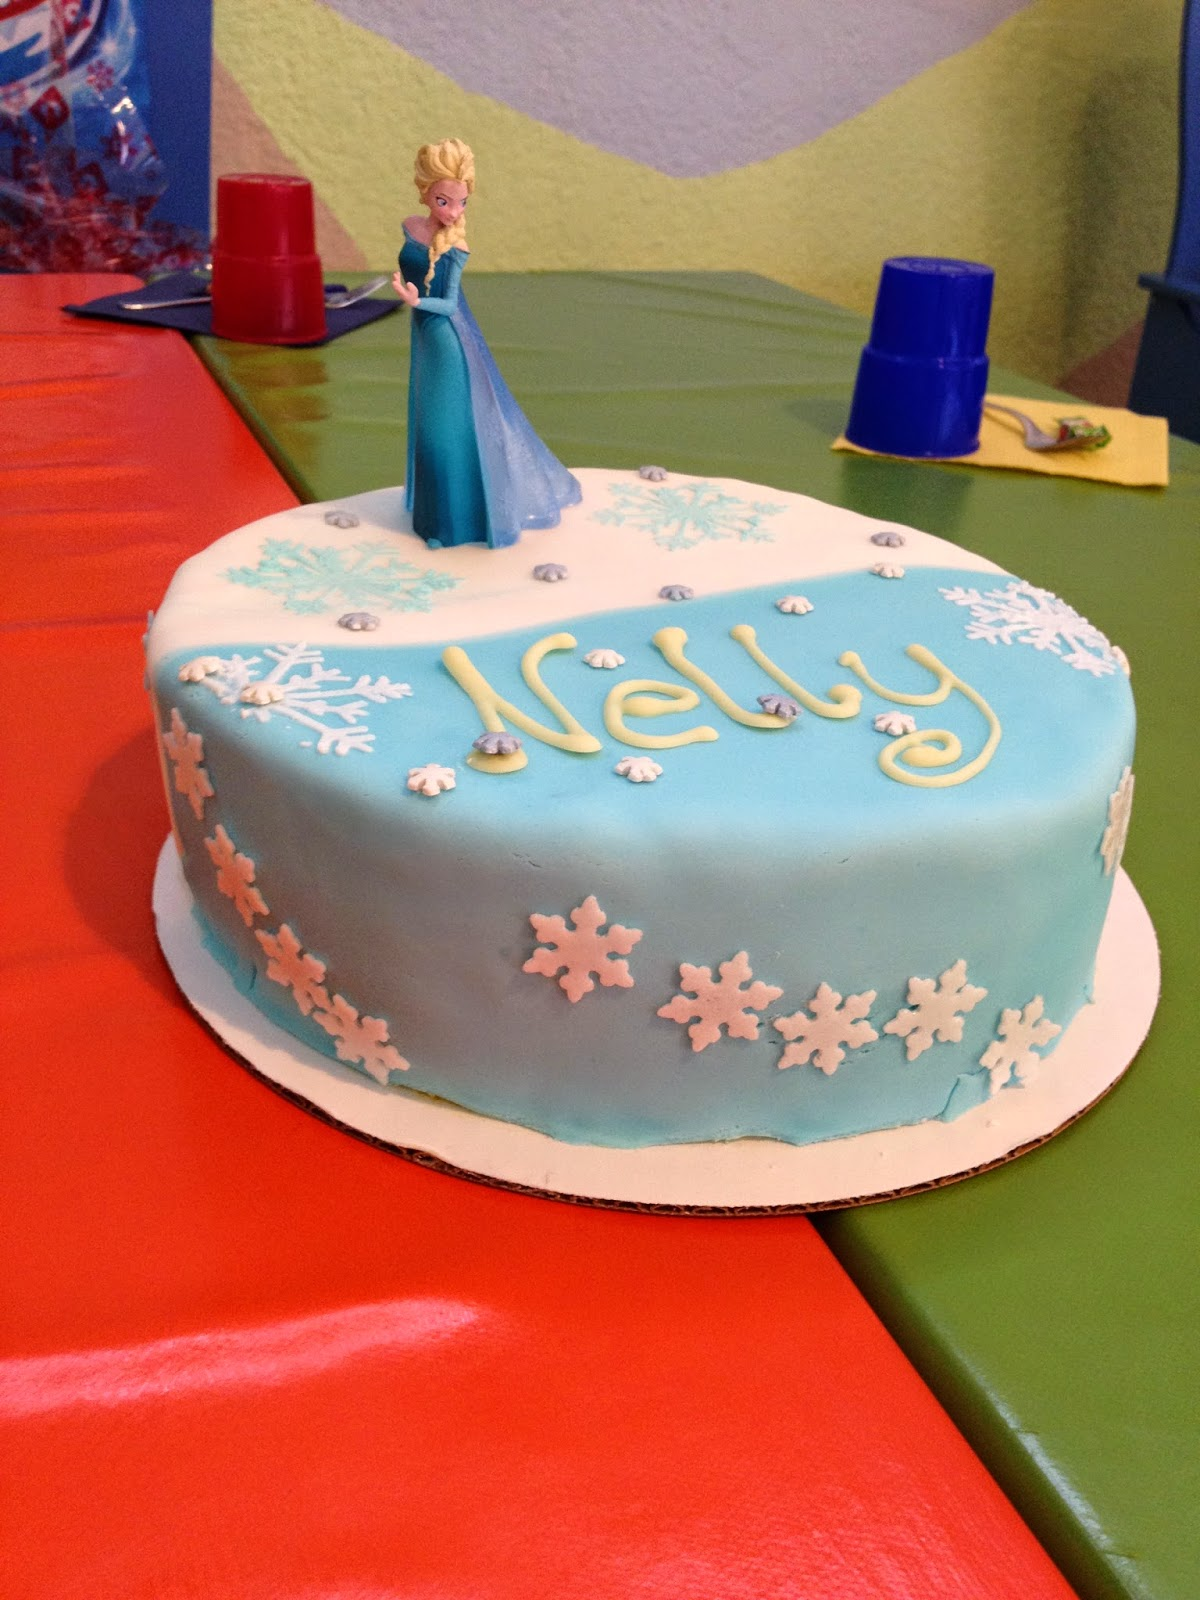 Kalorienhexe Elsa Eiskonigin Geburtstagstorte Fur Nelly